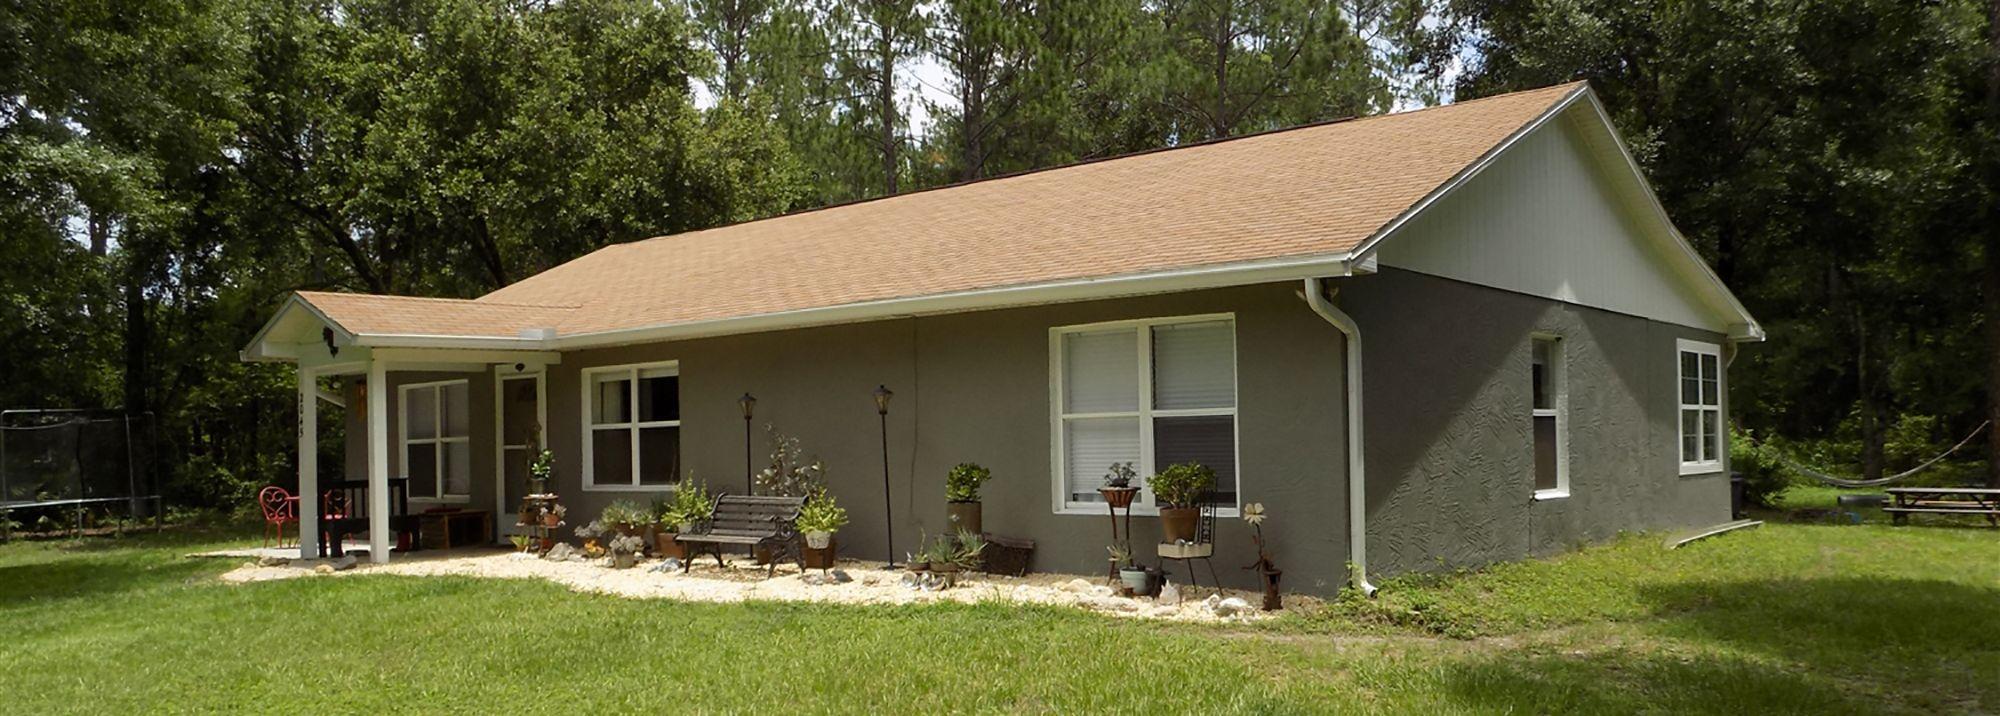 Home for sale 2045 Water Oak Road Bunnell, FL 32110 http